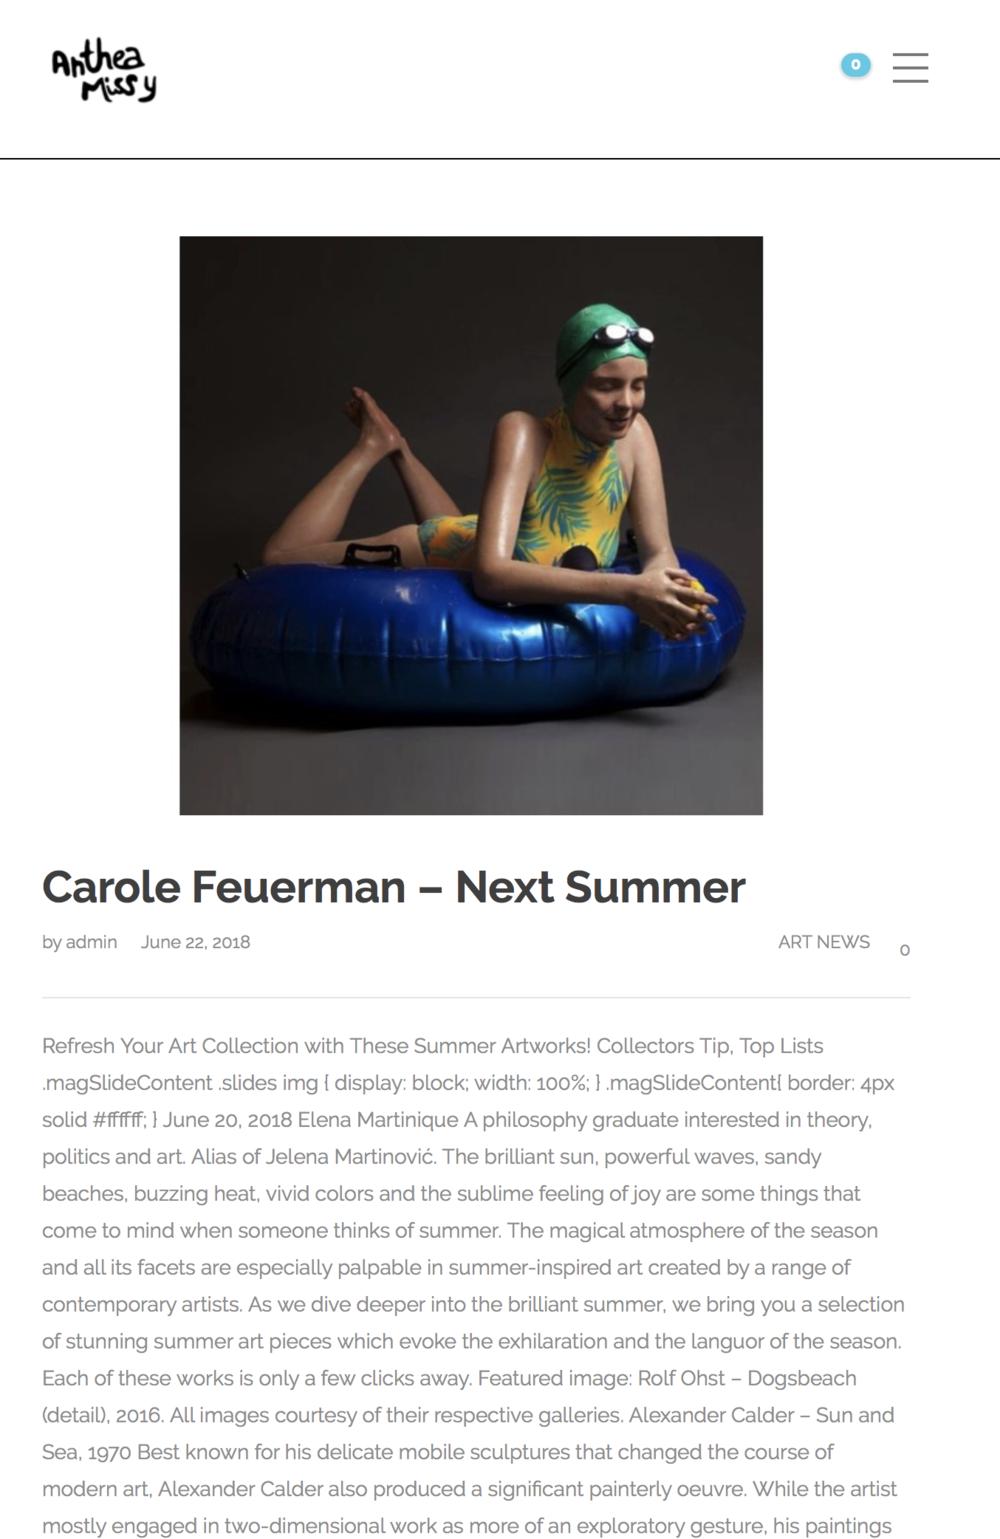 Carole Feuerman - Next Summer